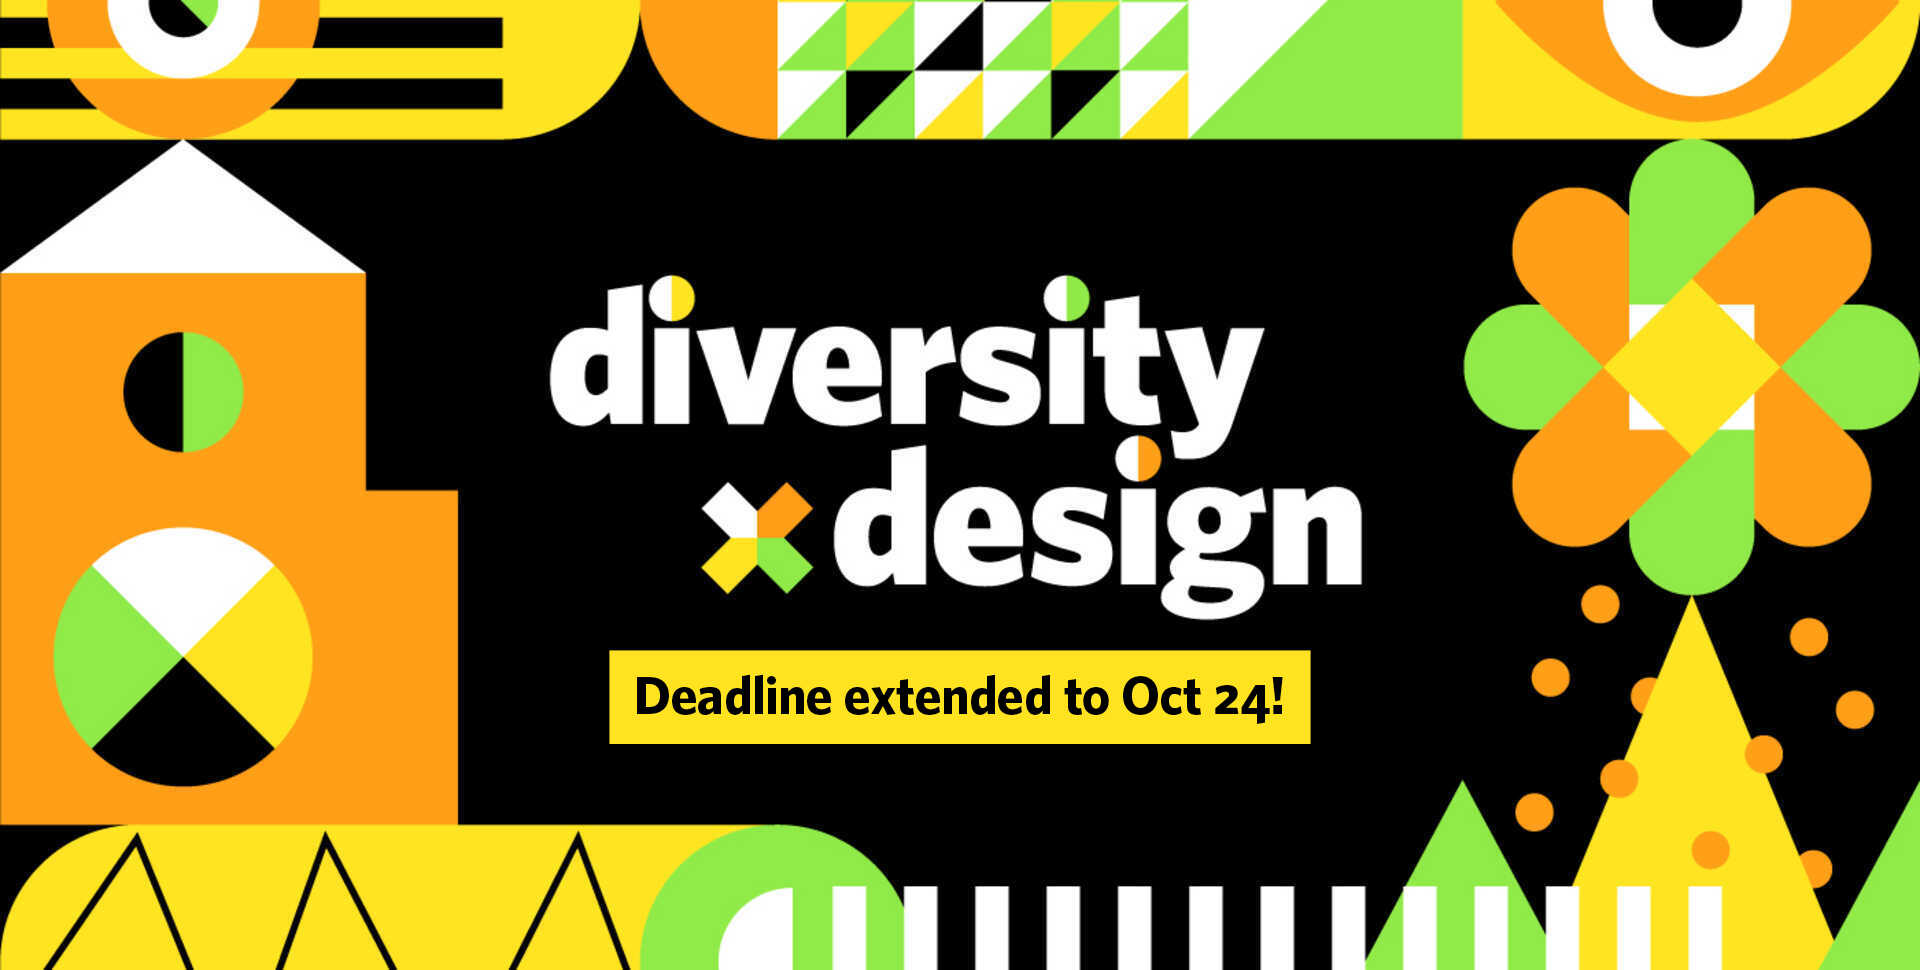 Deadline extended to October 24